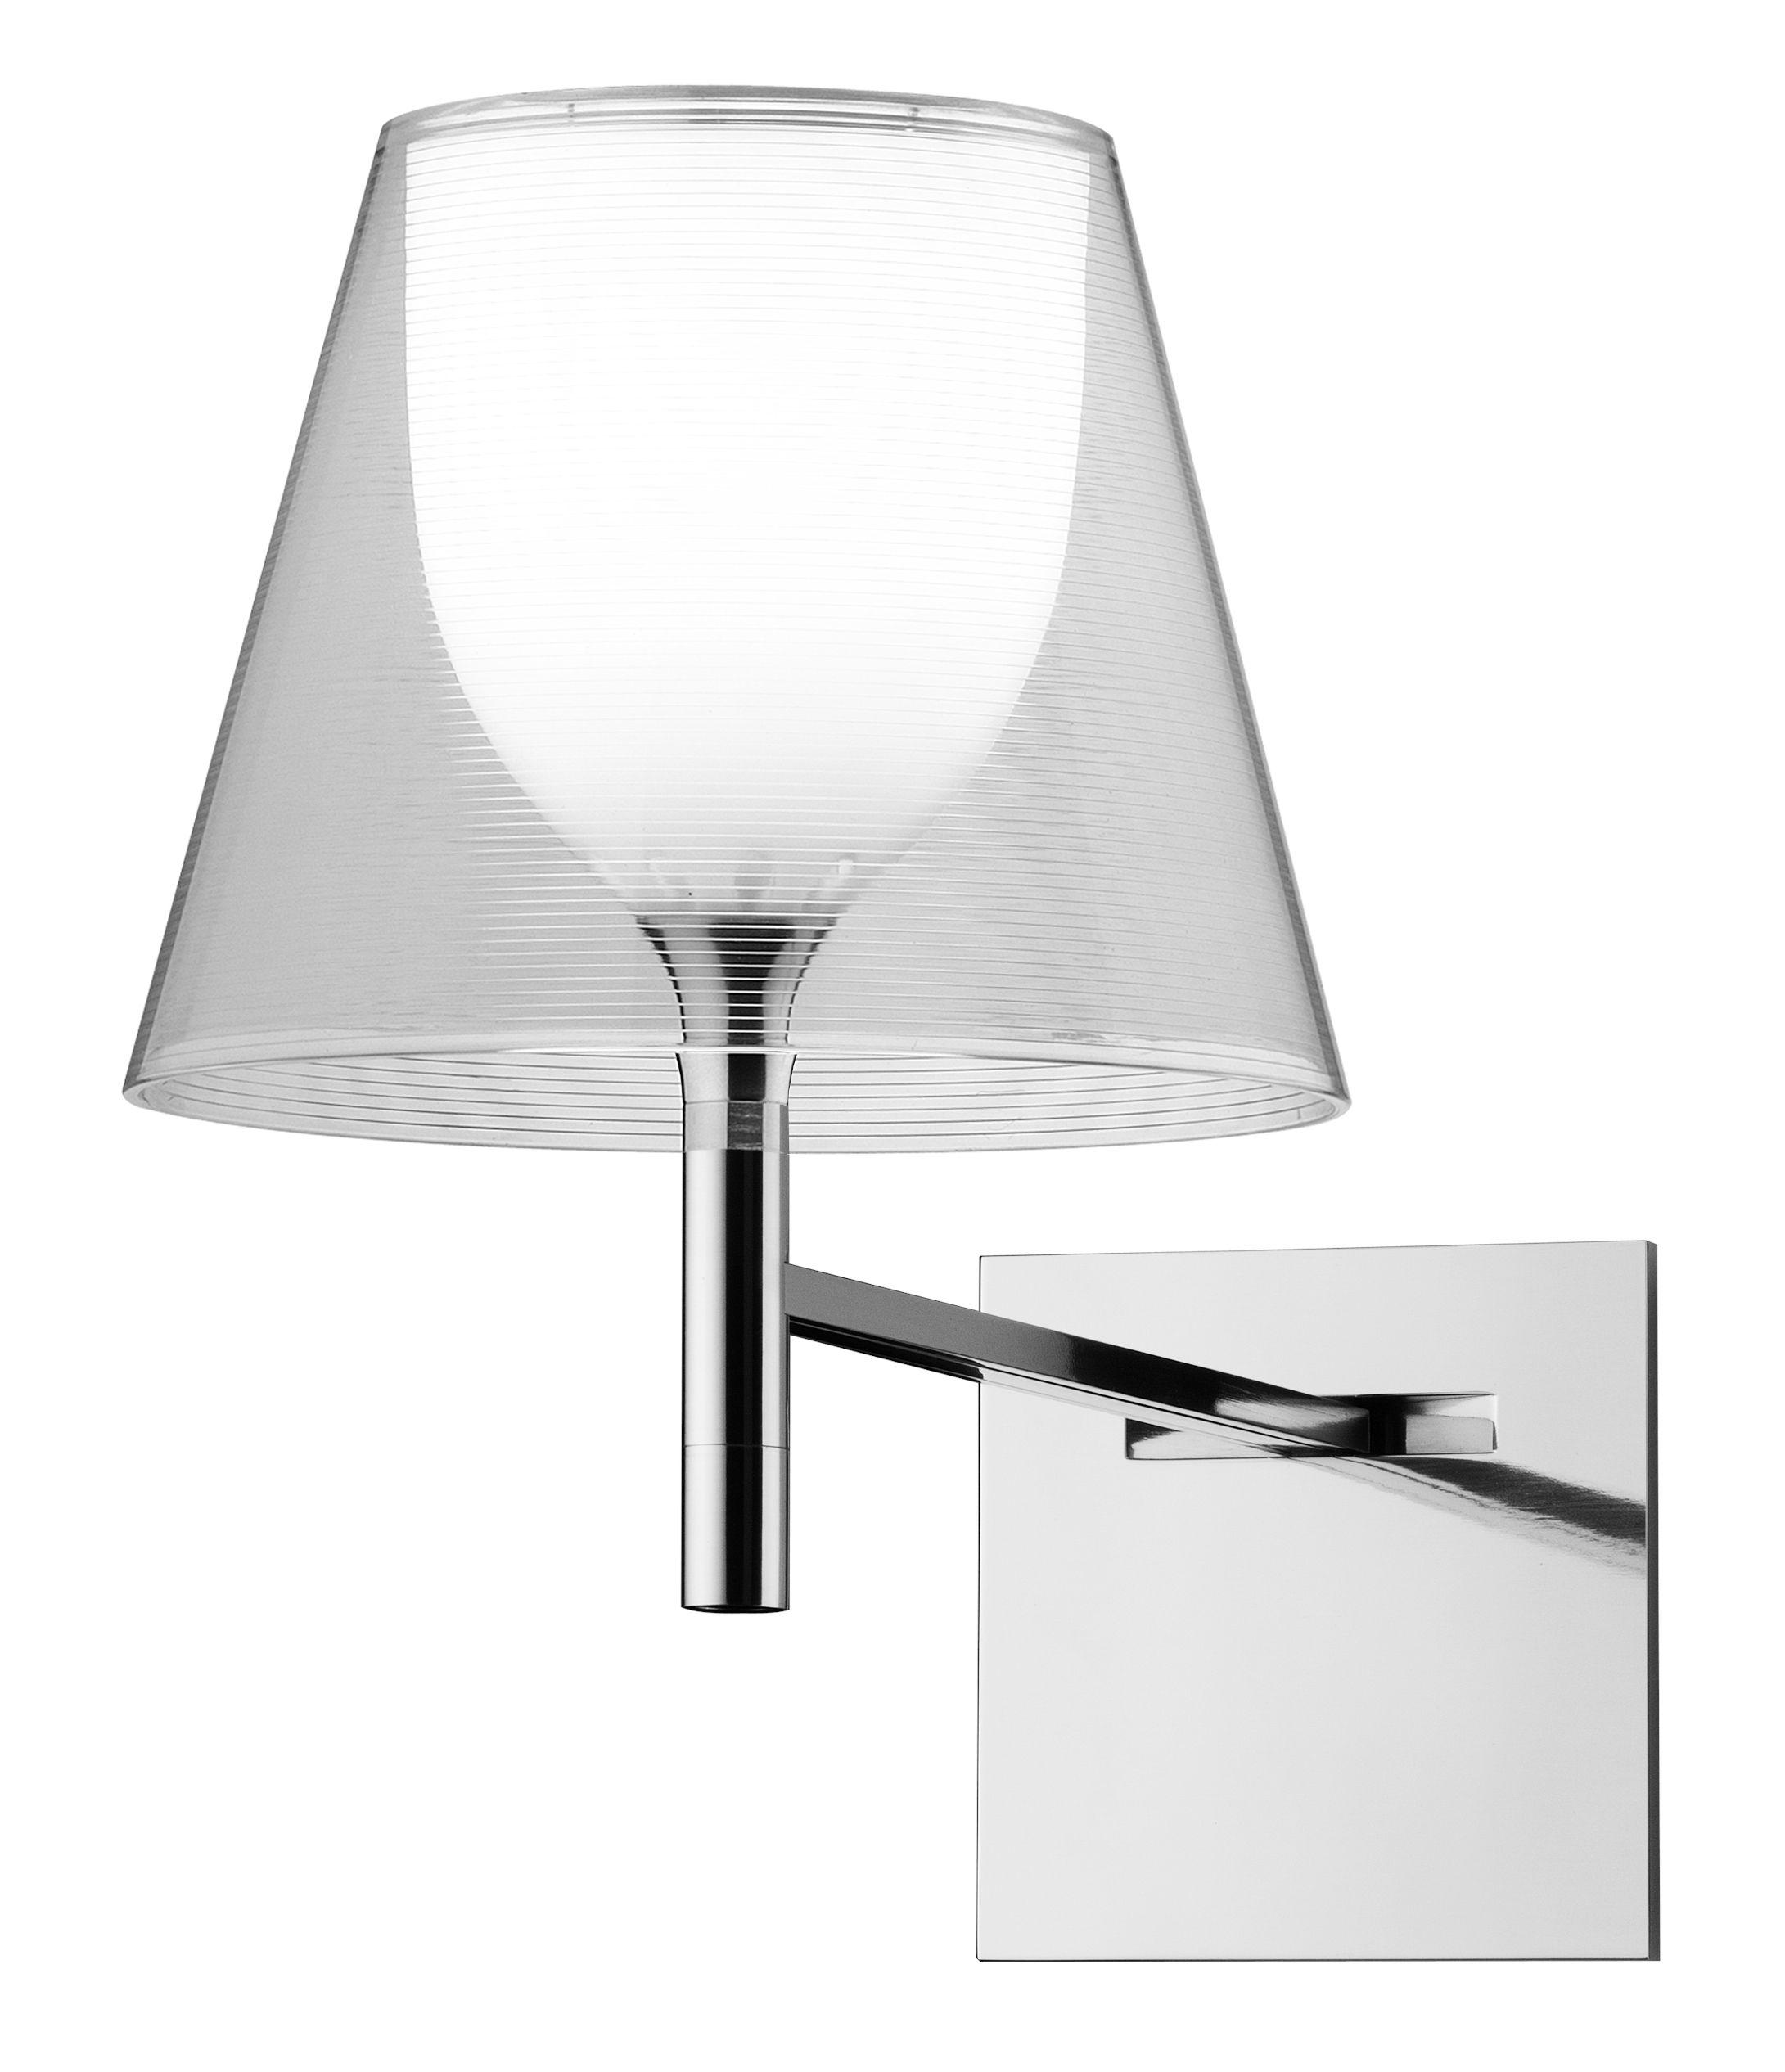 Luminaire - Appliques - Applique K Tribe W - Flos - Transparent - Aluminium poli, PMMA